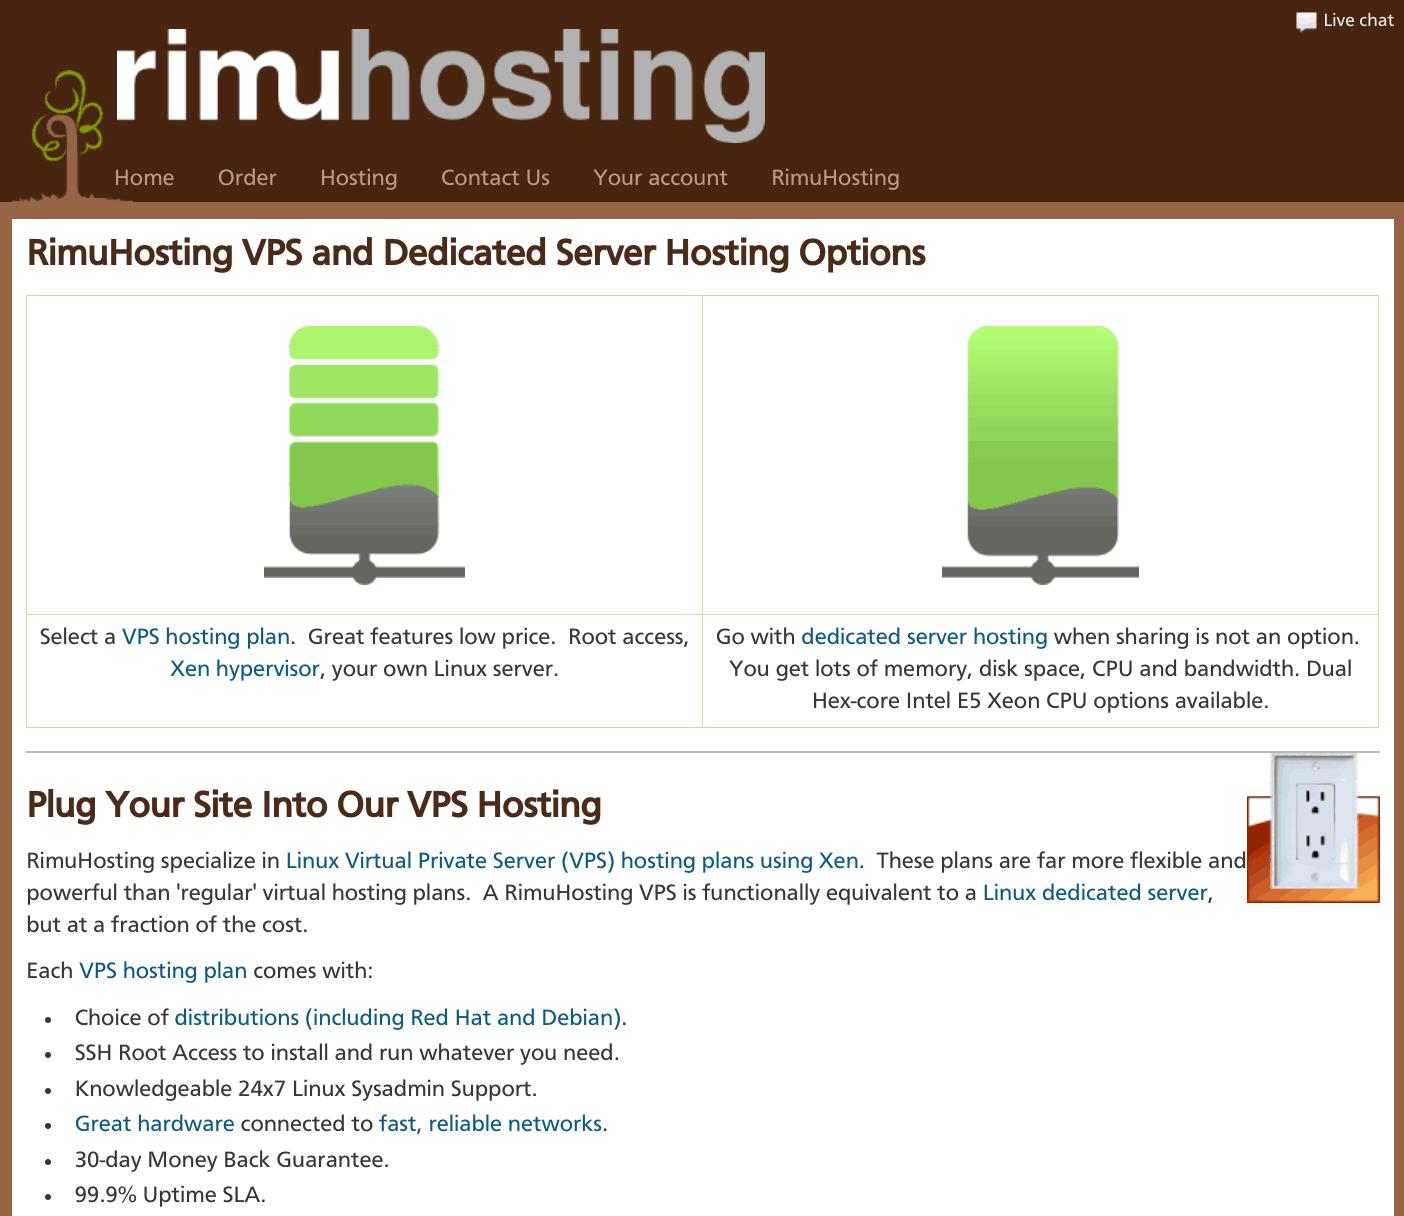 RimuHosting